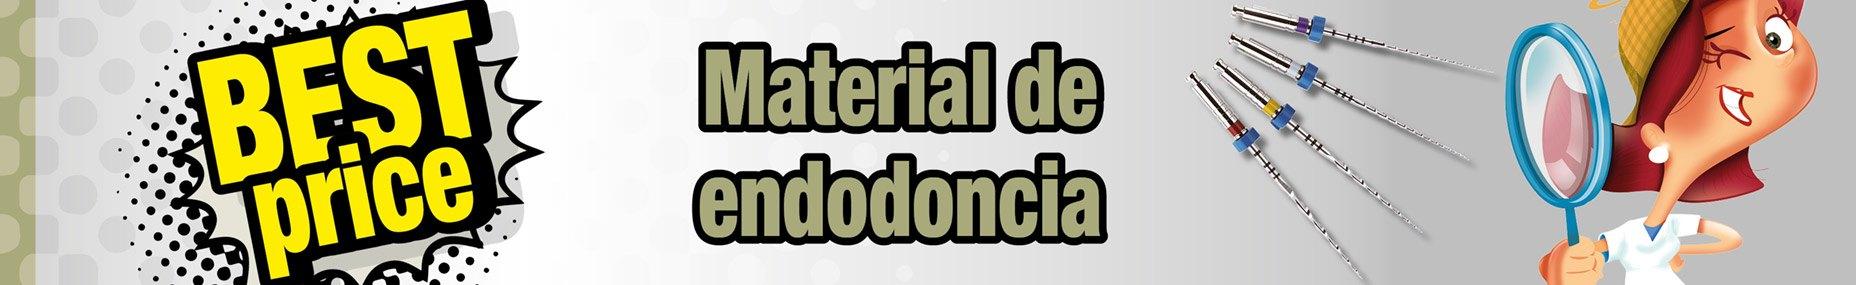 Endodoncia image